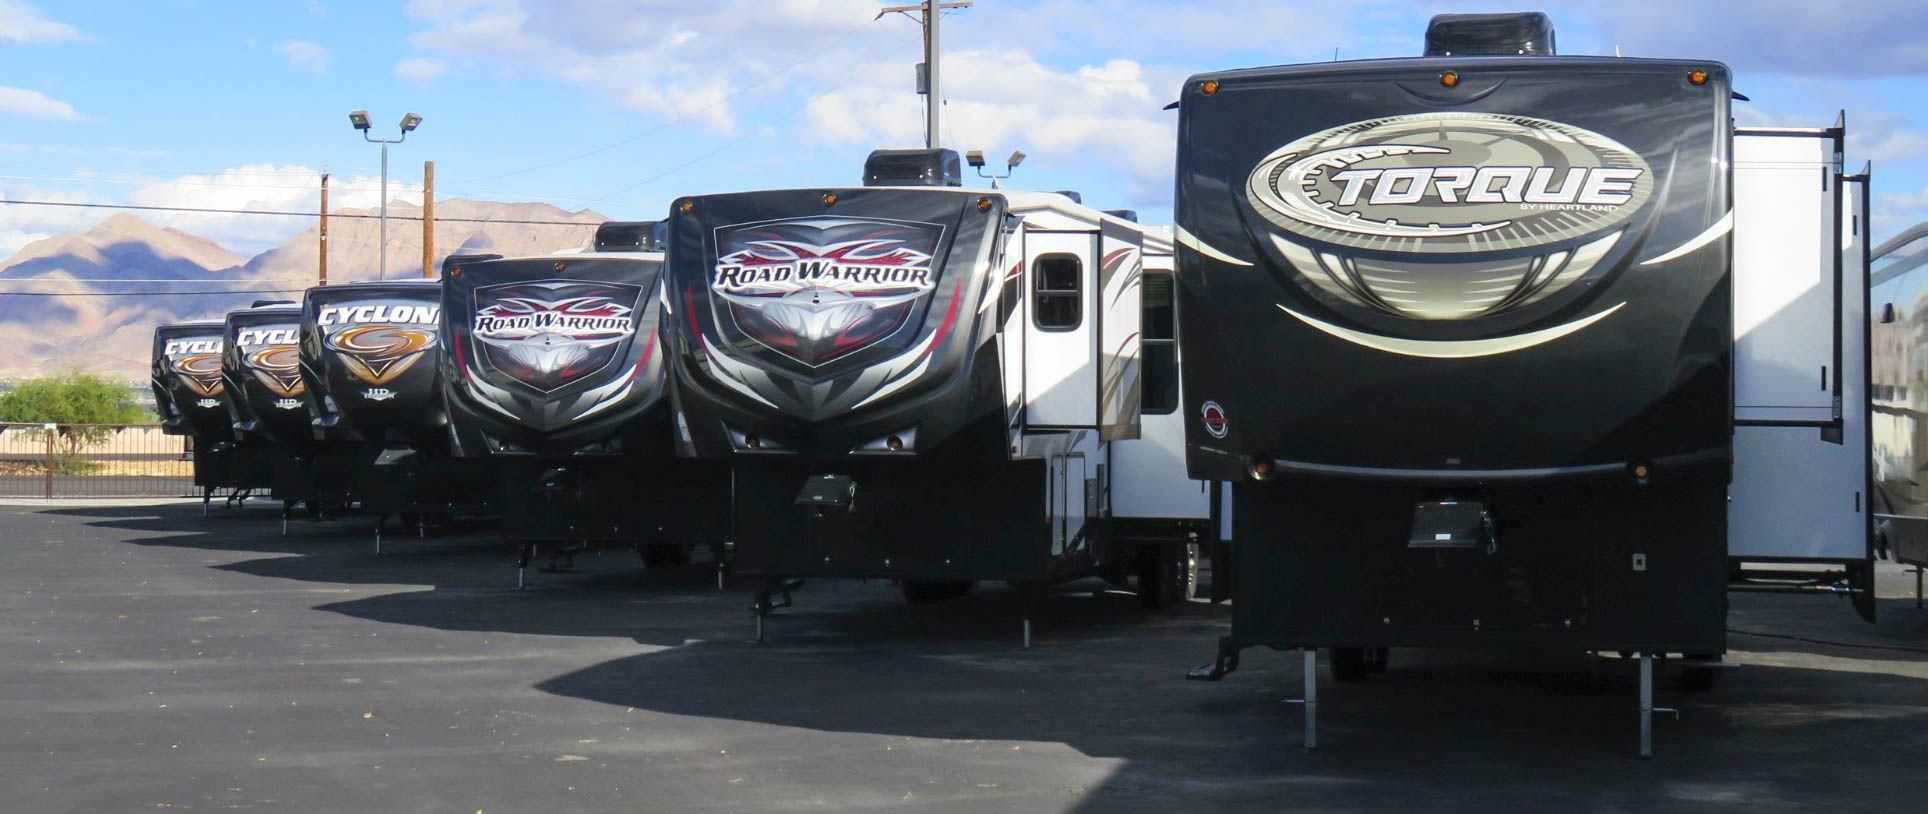 #MyHeartland #HeartlandOC #Cyclone #RoadWarrior #Torque   Johnnie Walker RV's, Las Vegas: http://www.johnniewalkerrv.com/  Heartland Toy Haulers: http://www.heartlandrvs.com/brands/toyhaulers